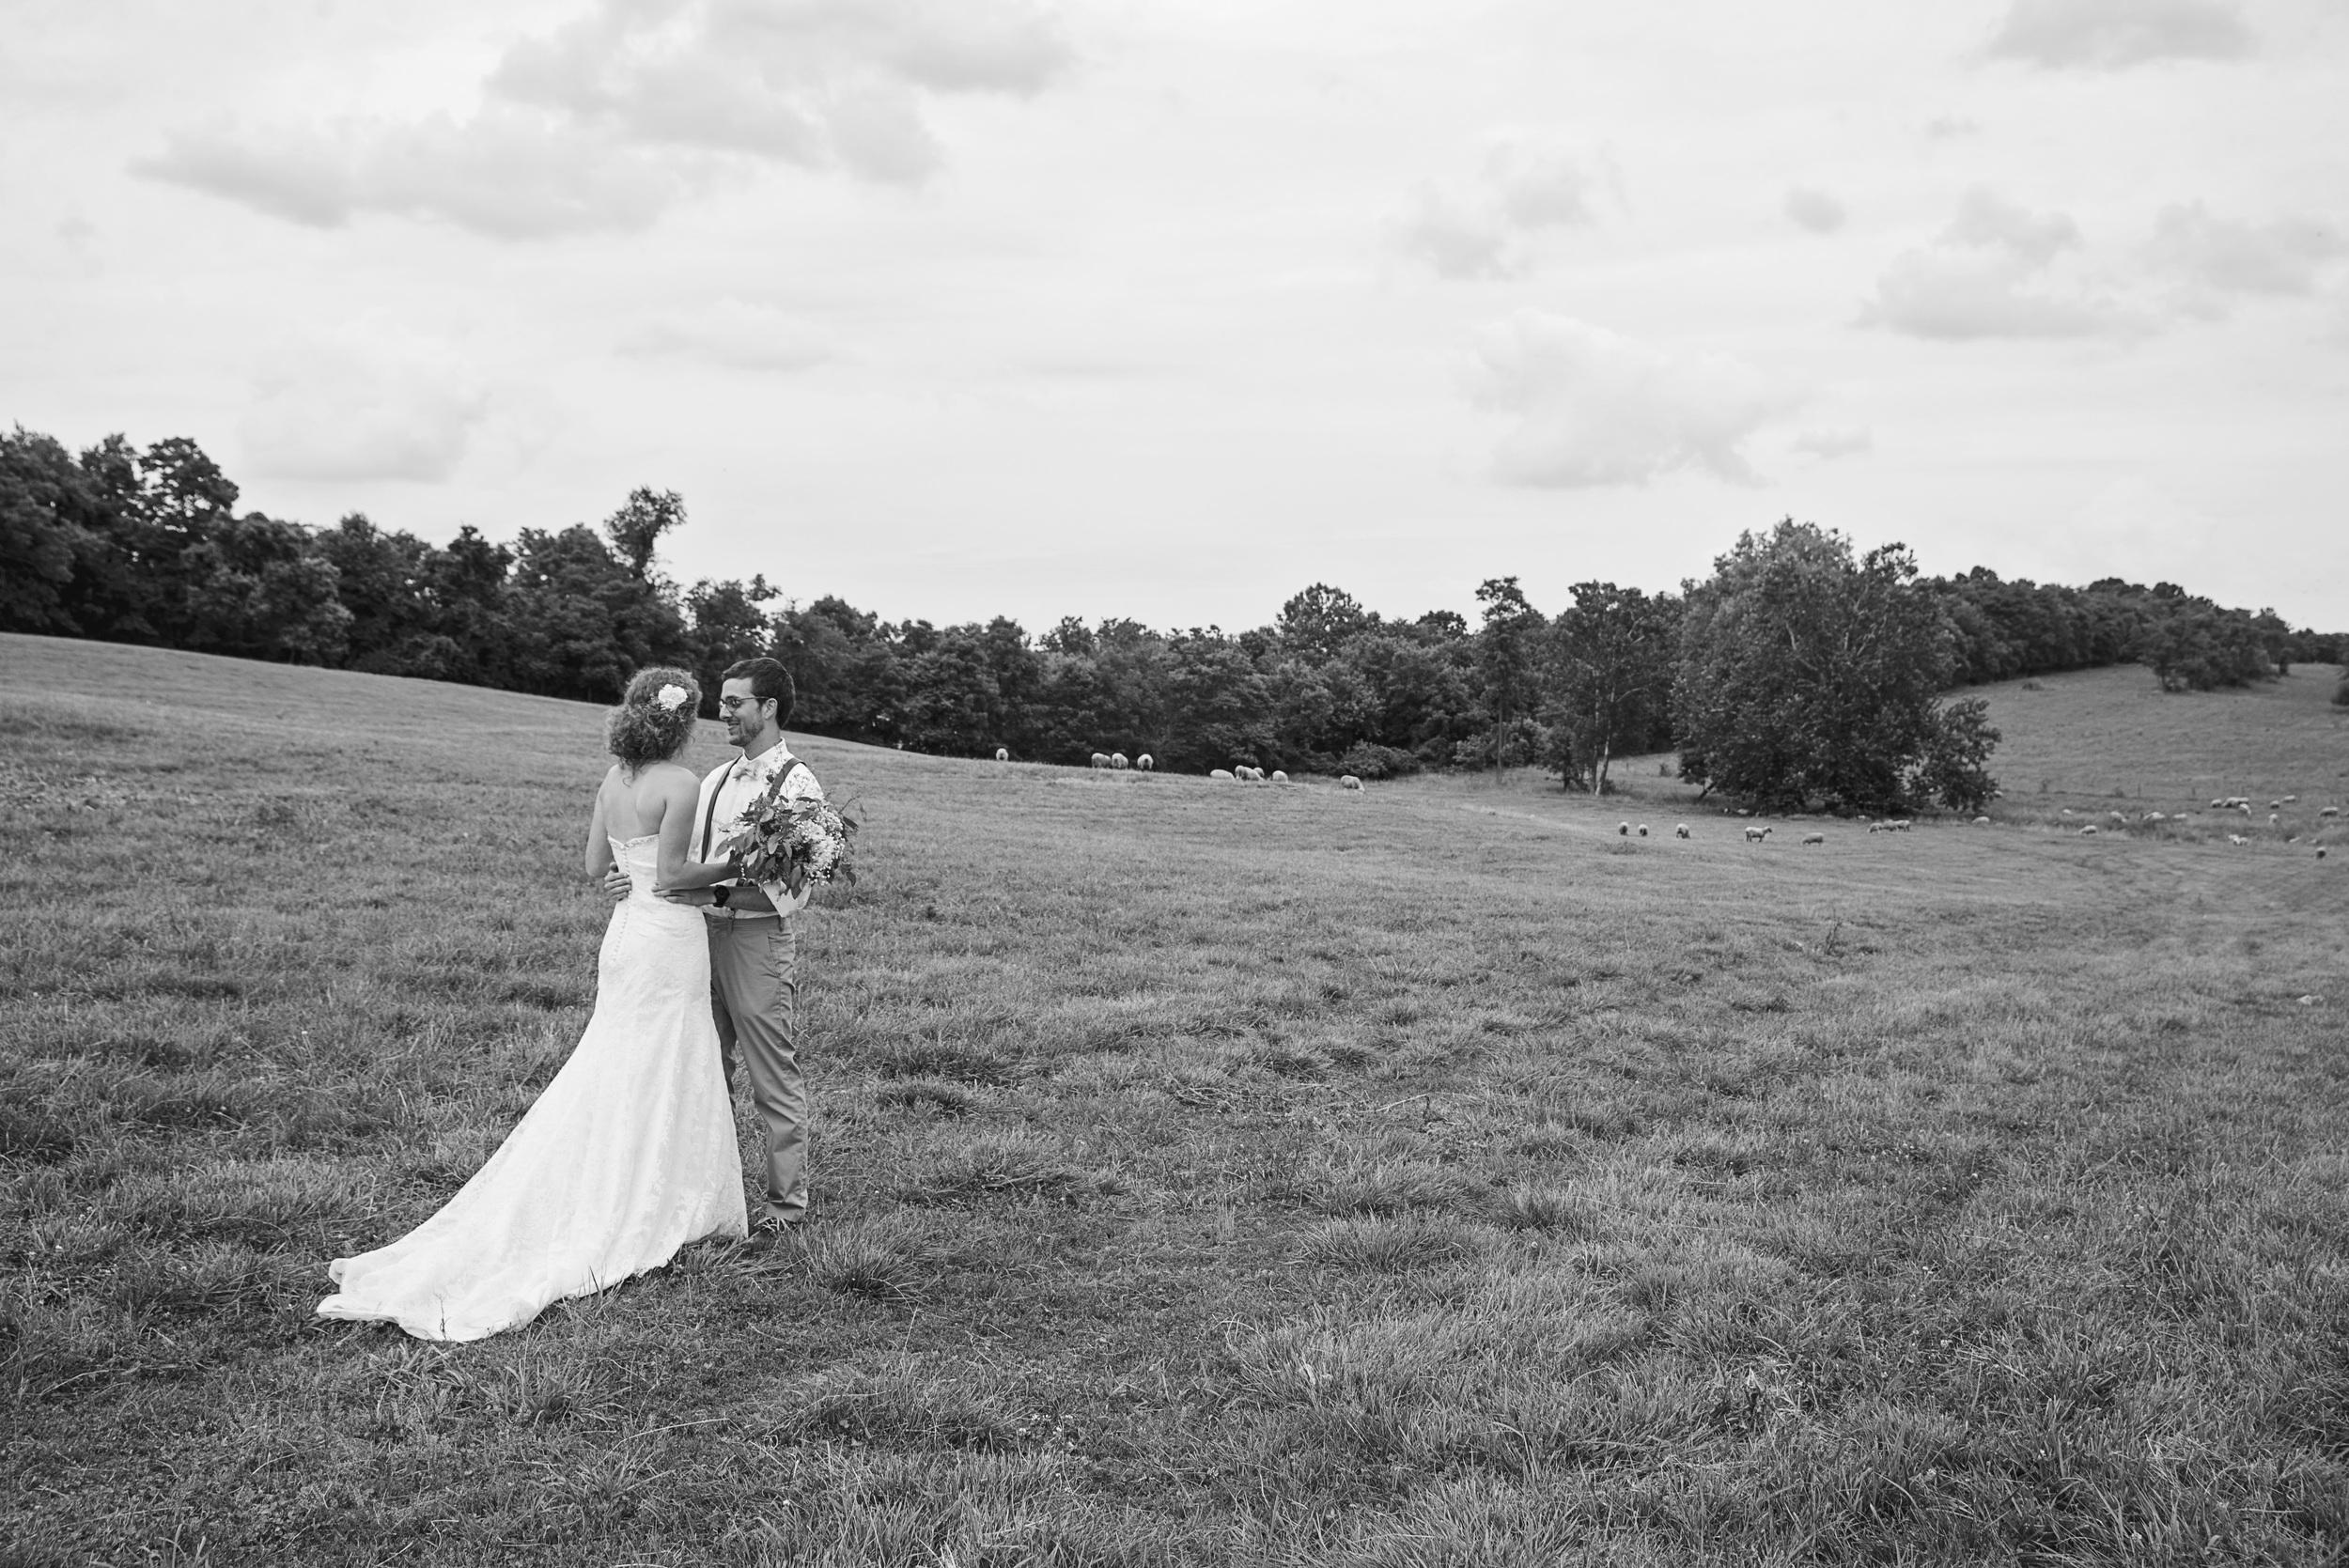 rustic_chic_farm_field__barn_wedding_lynchburg_va025.jpg